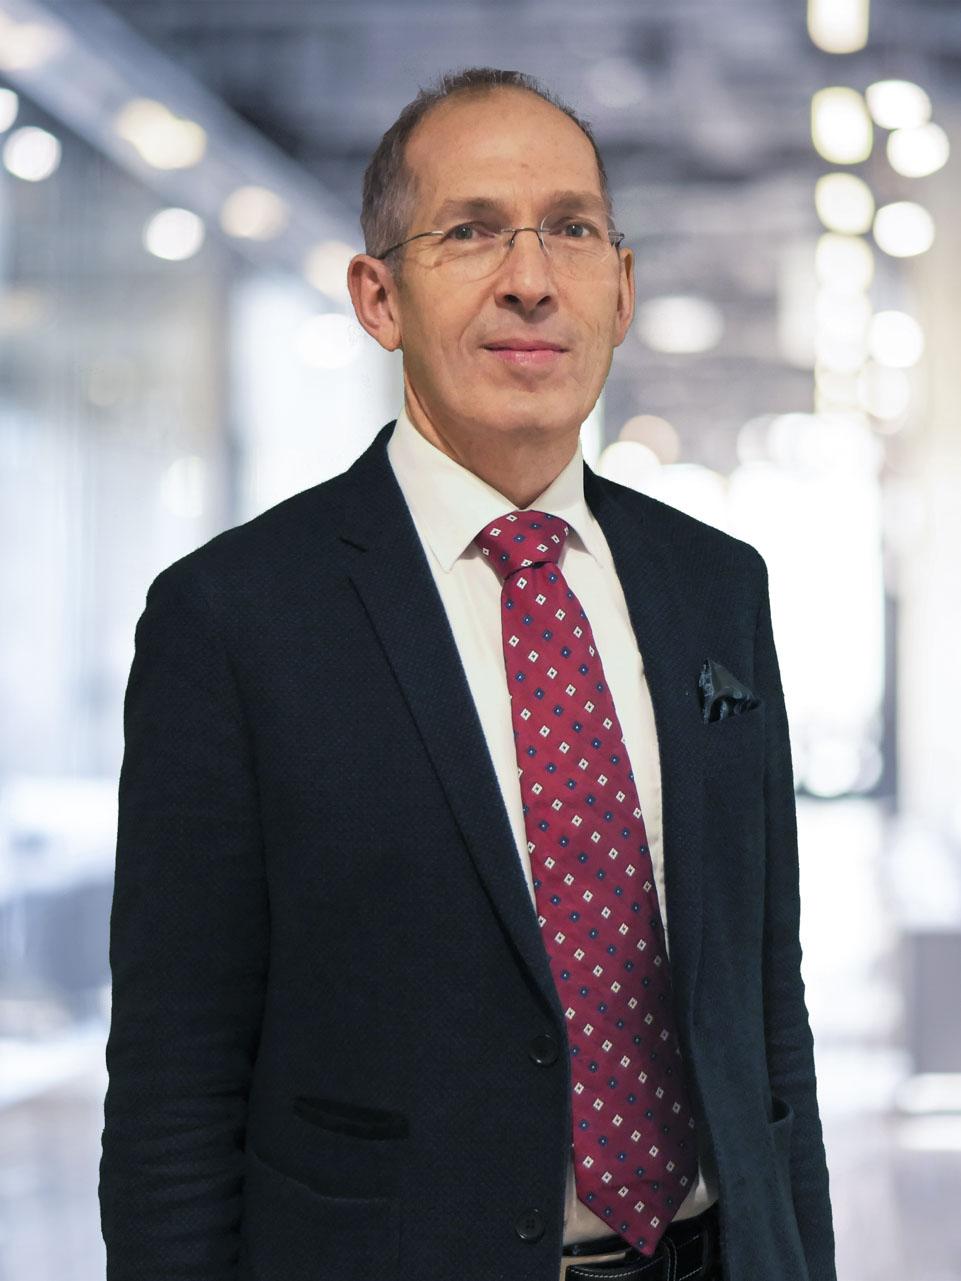 Salzburger Notariatskammer: Notar Dr. Alexander Hüttinger